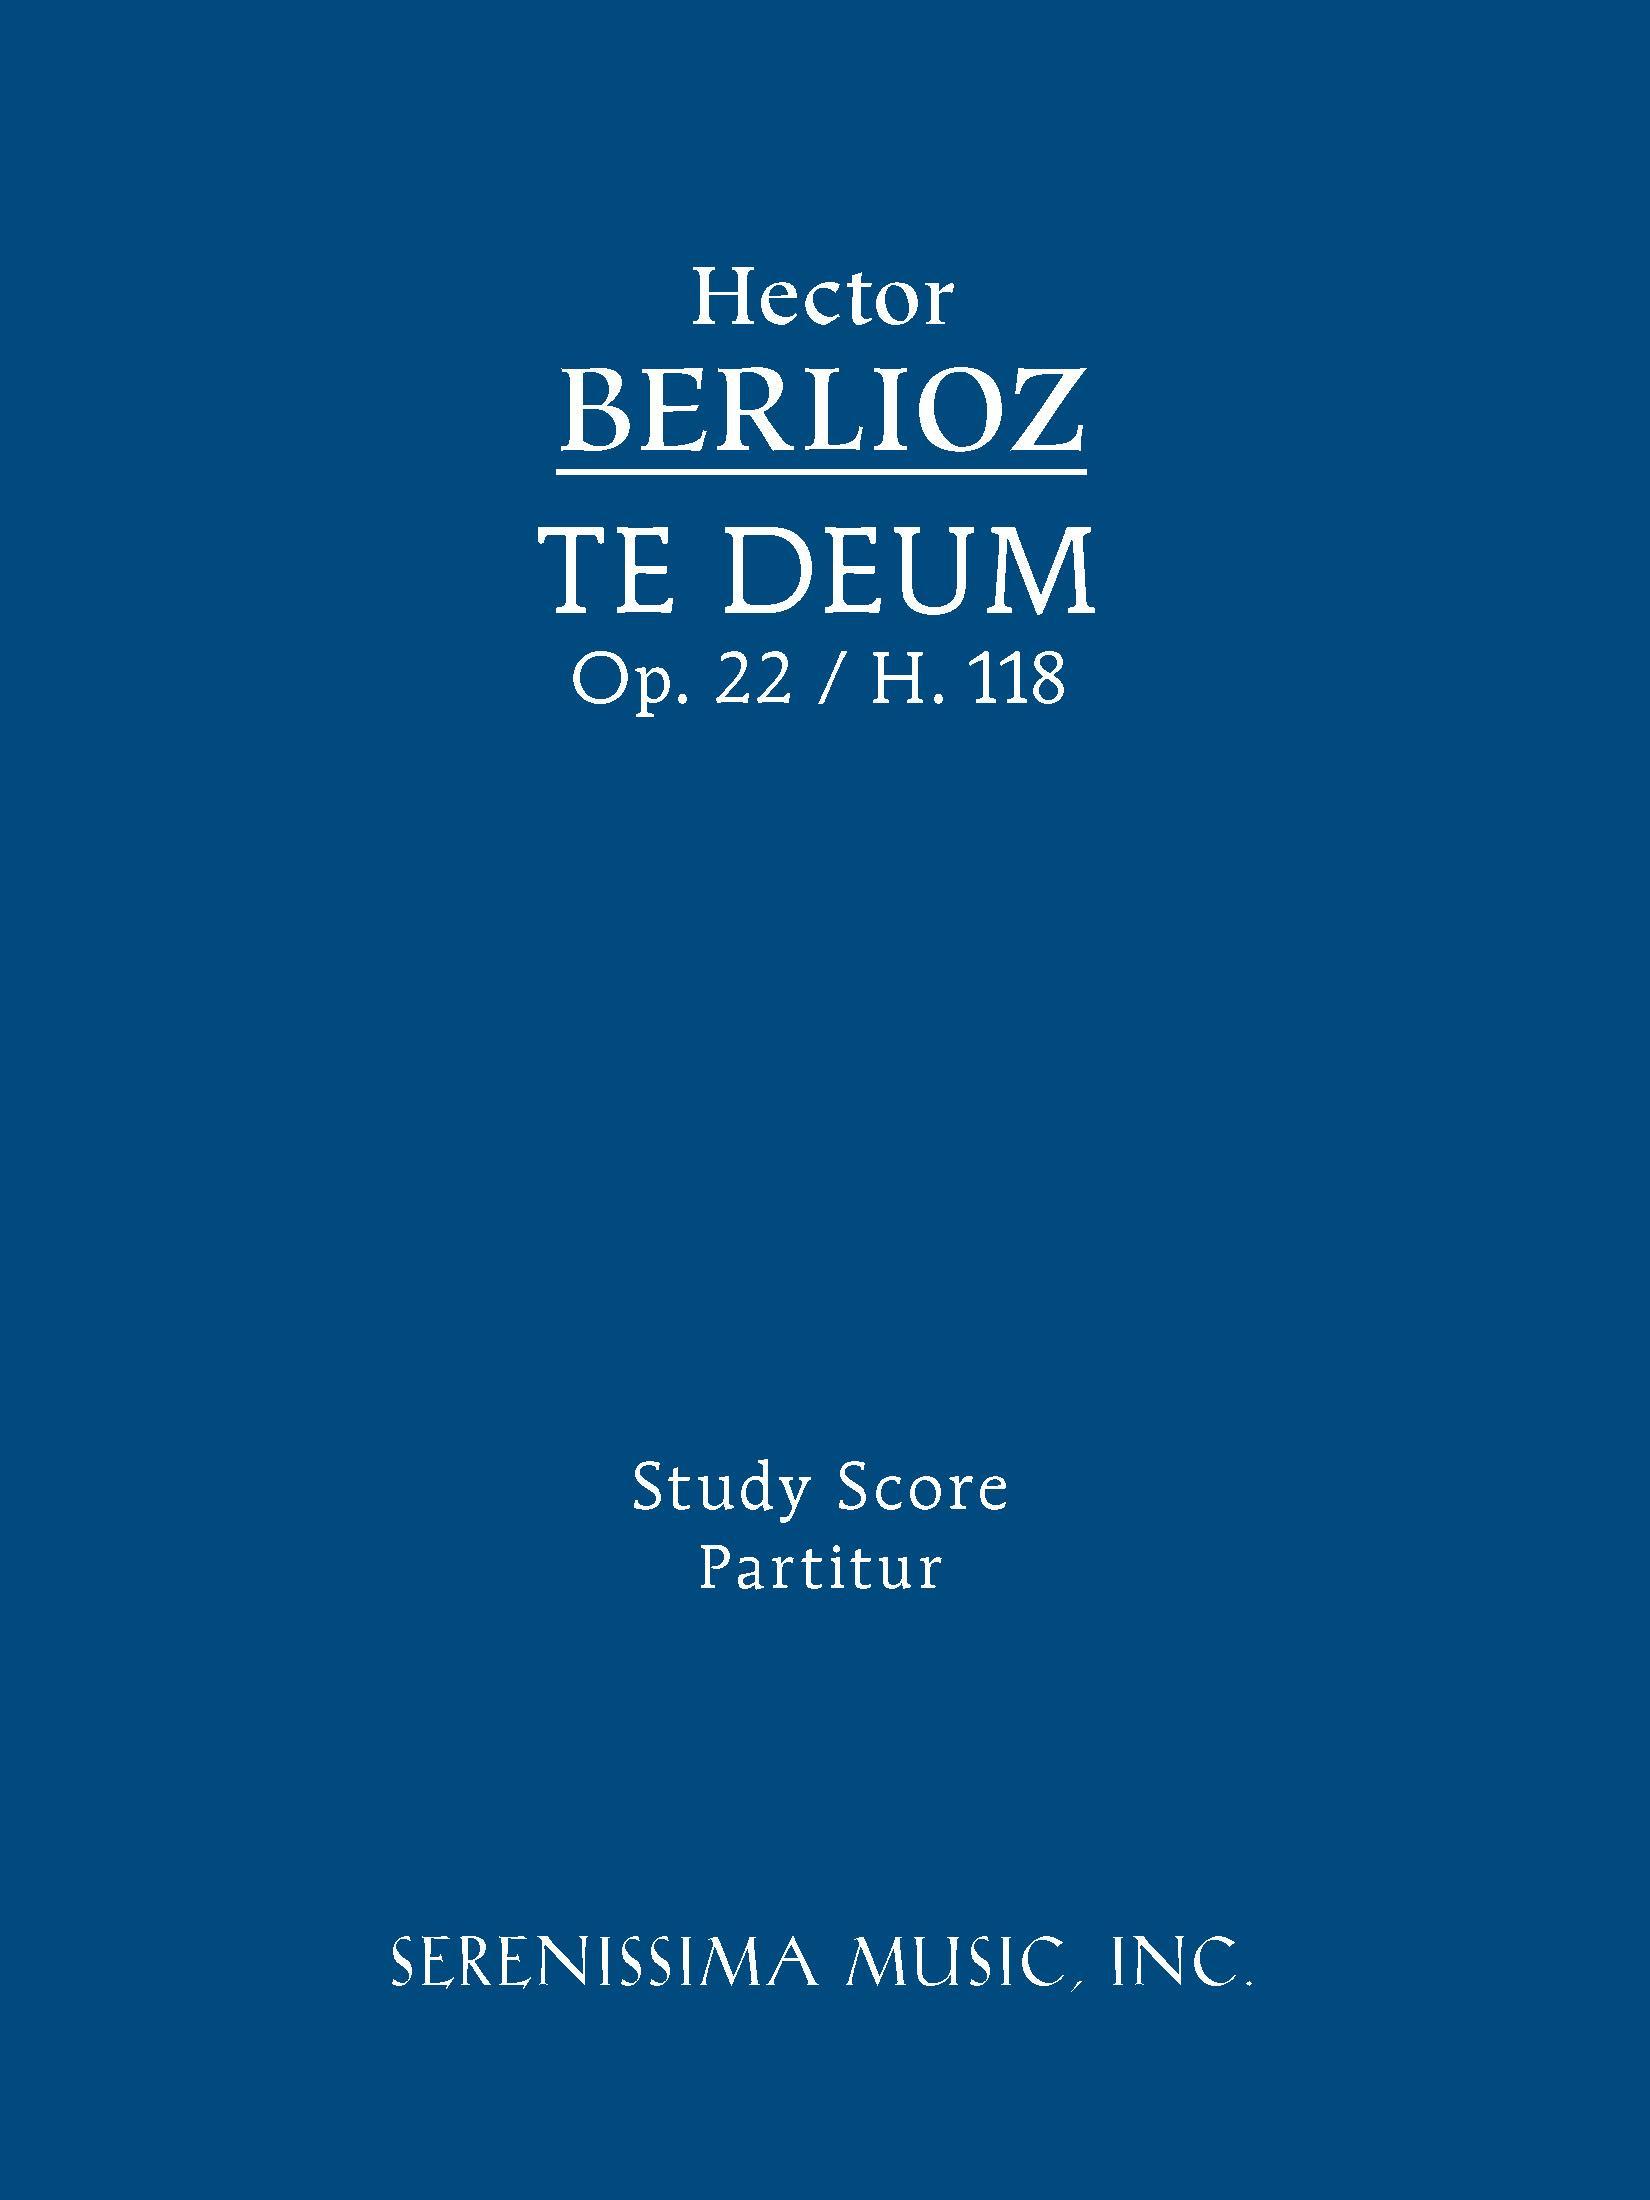 Te Deum, Op. 22 / H. 118 - Study Score EB2370004231730